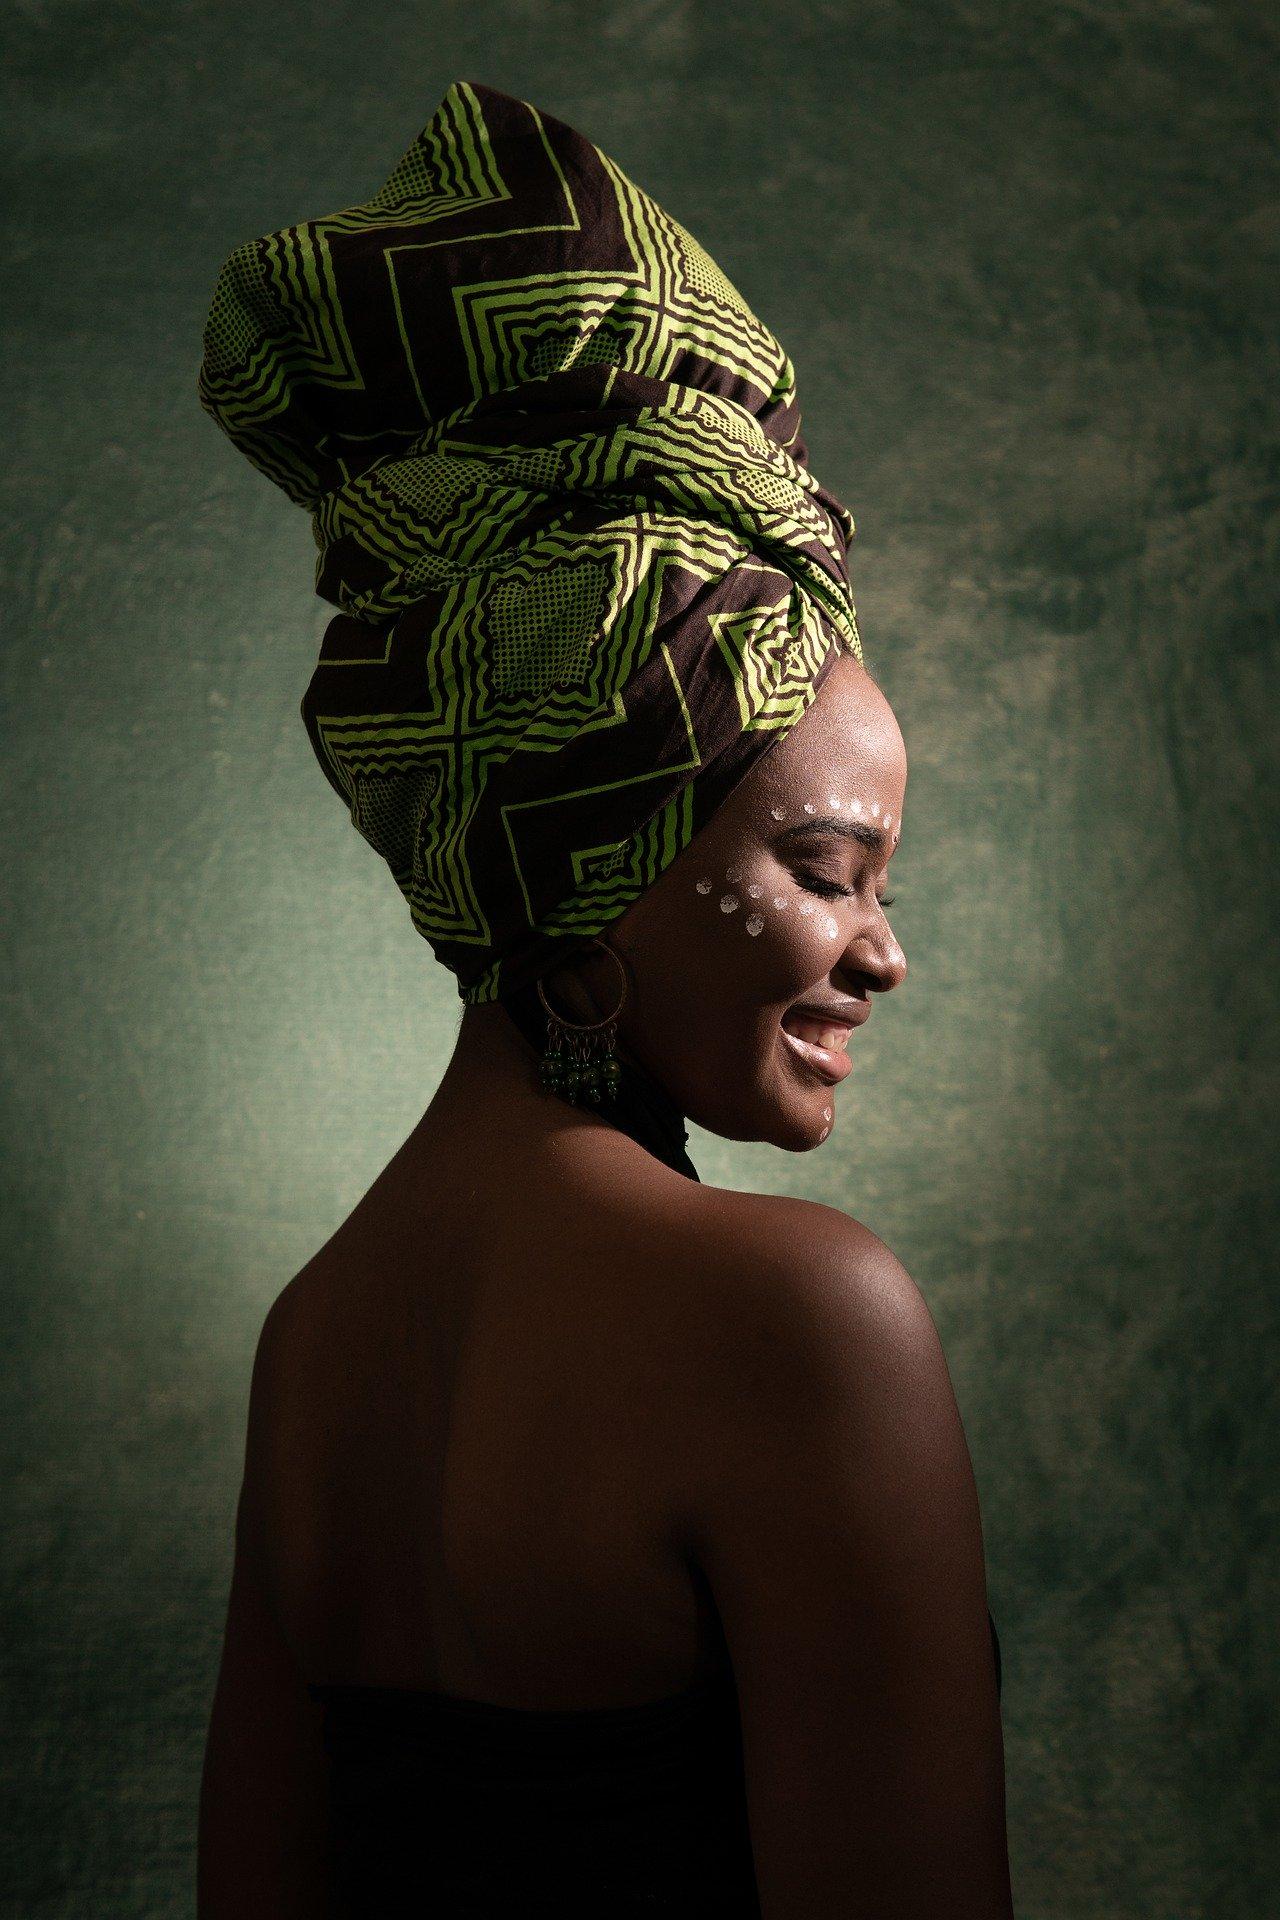 https://pixabay.com/photos/woman-african-people-black-girl-4685862/